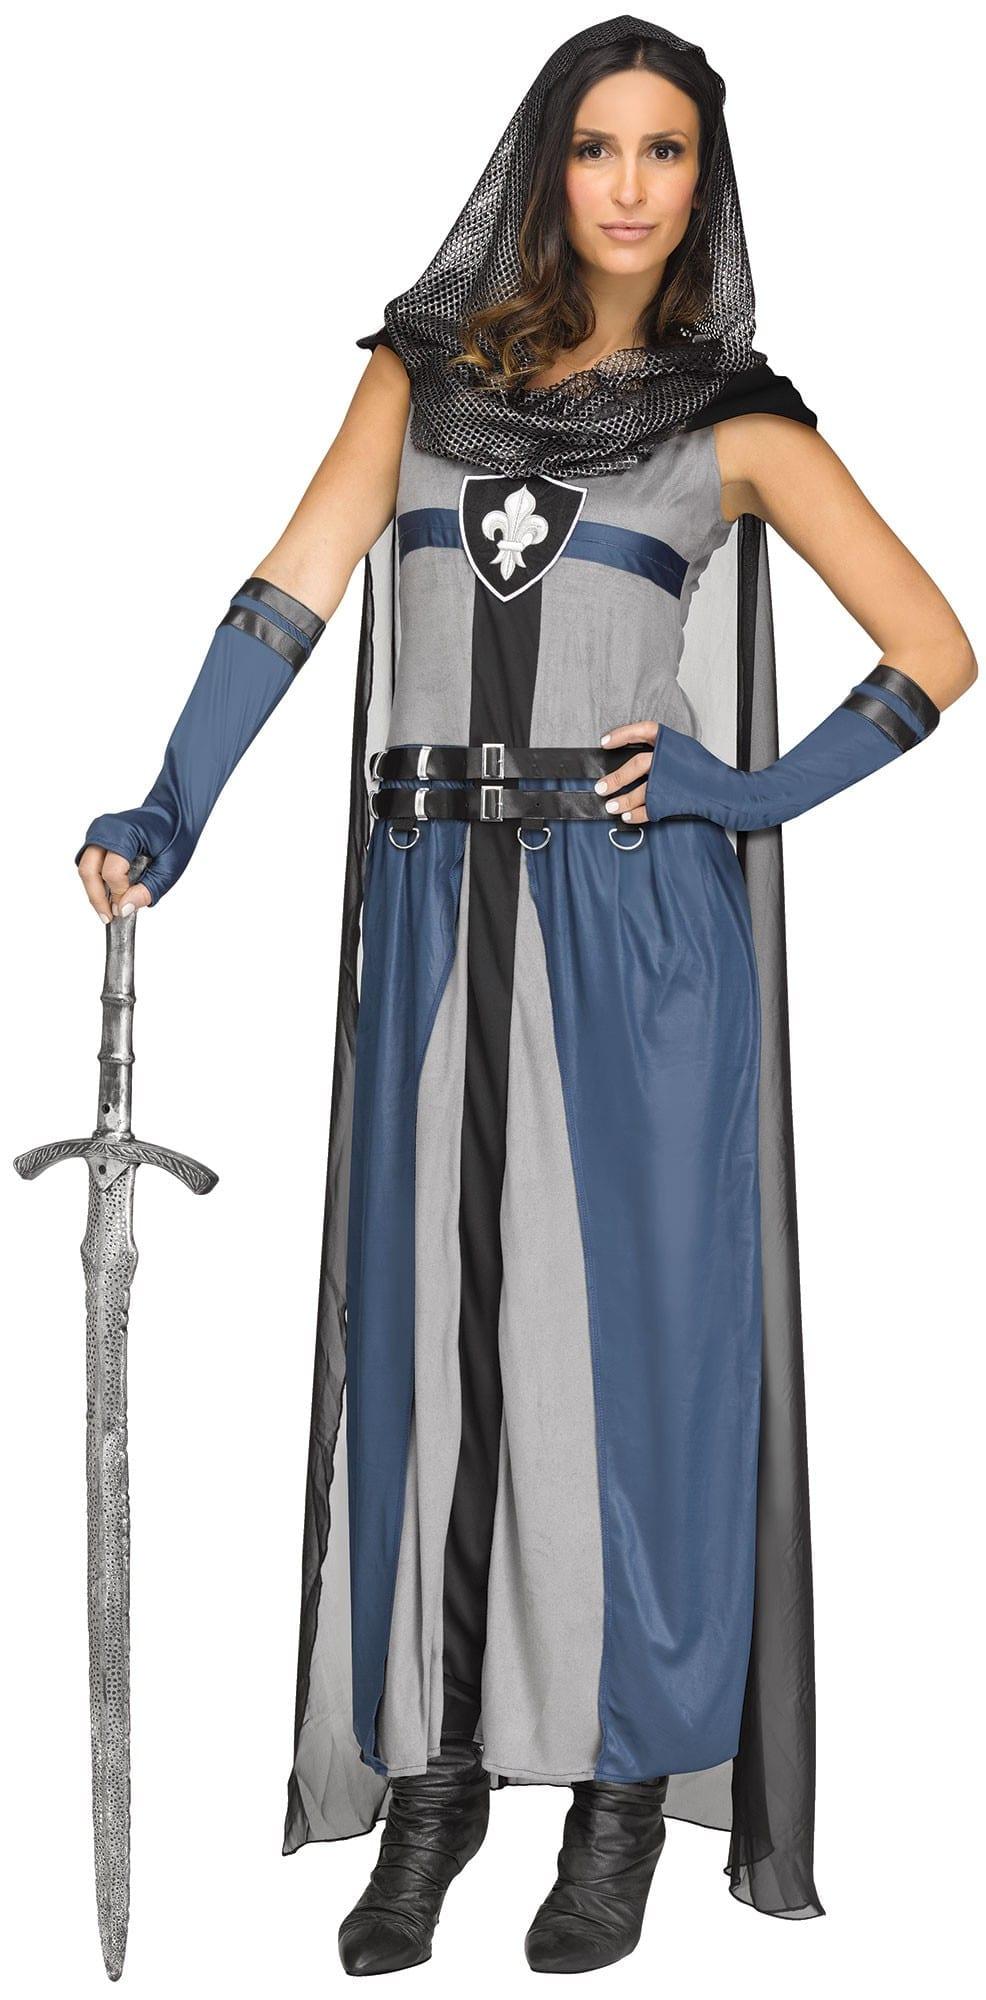 Lady LionHeart Adult Costume -0